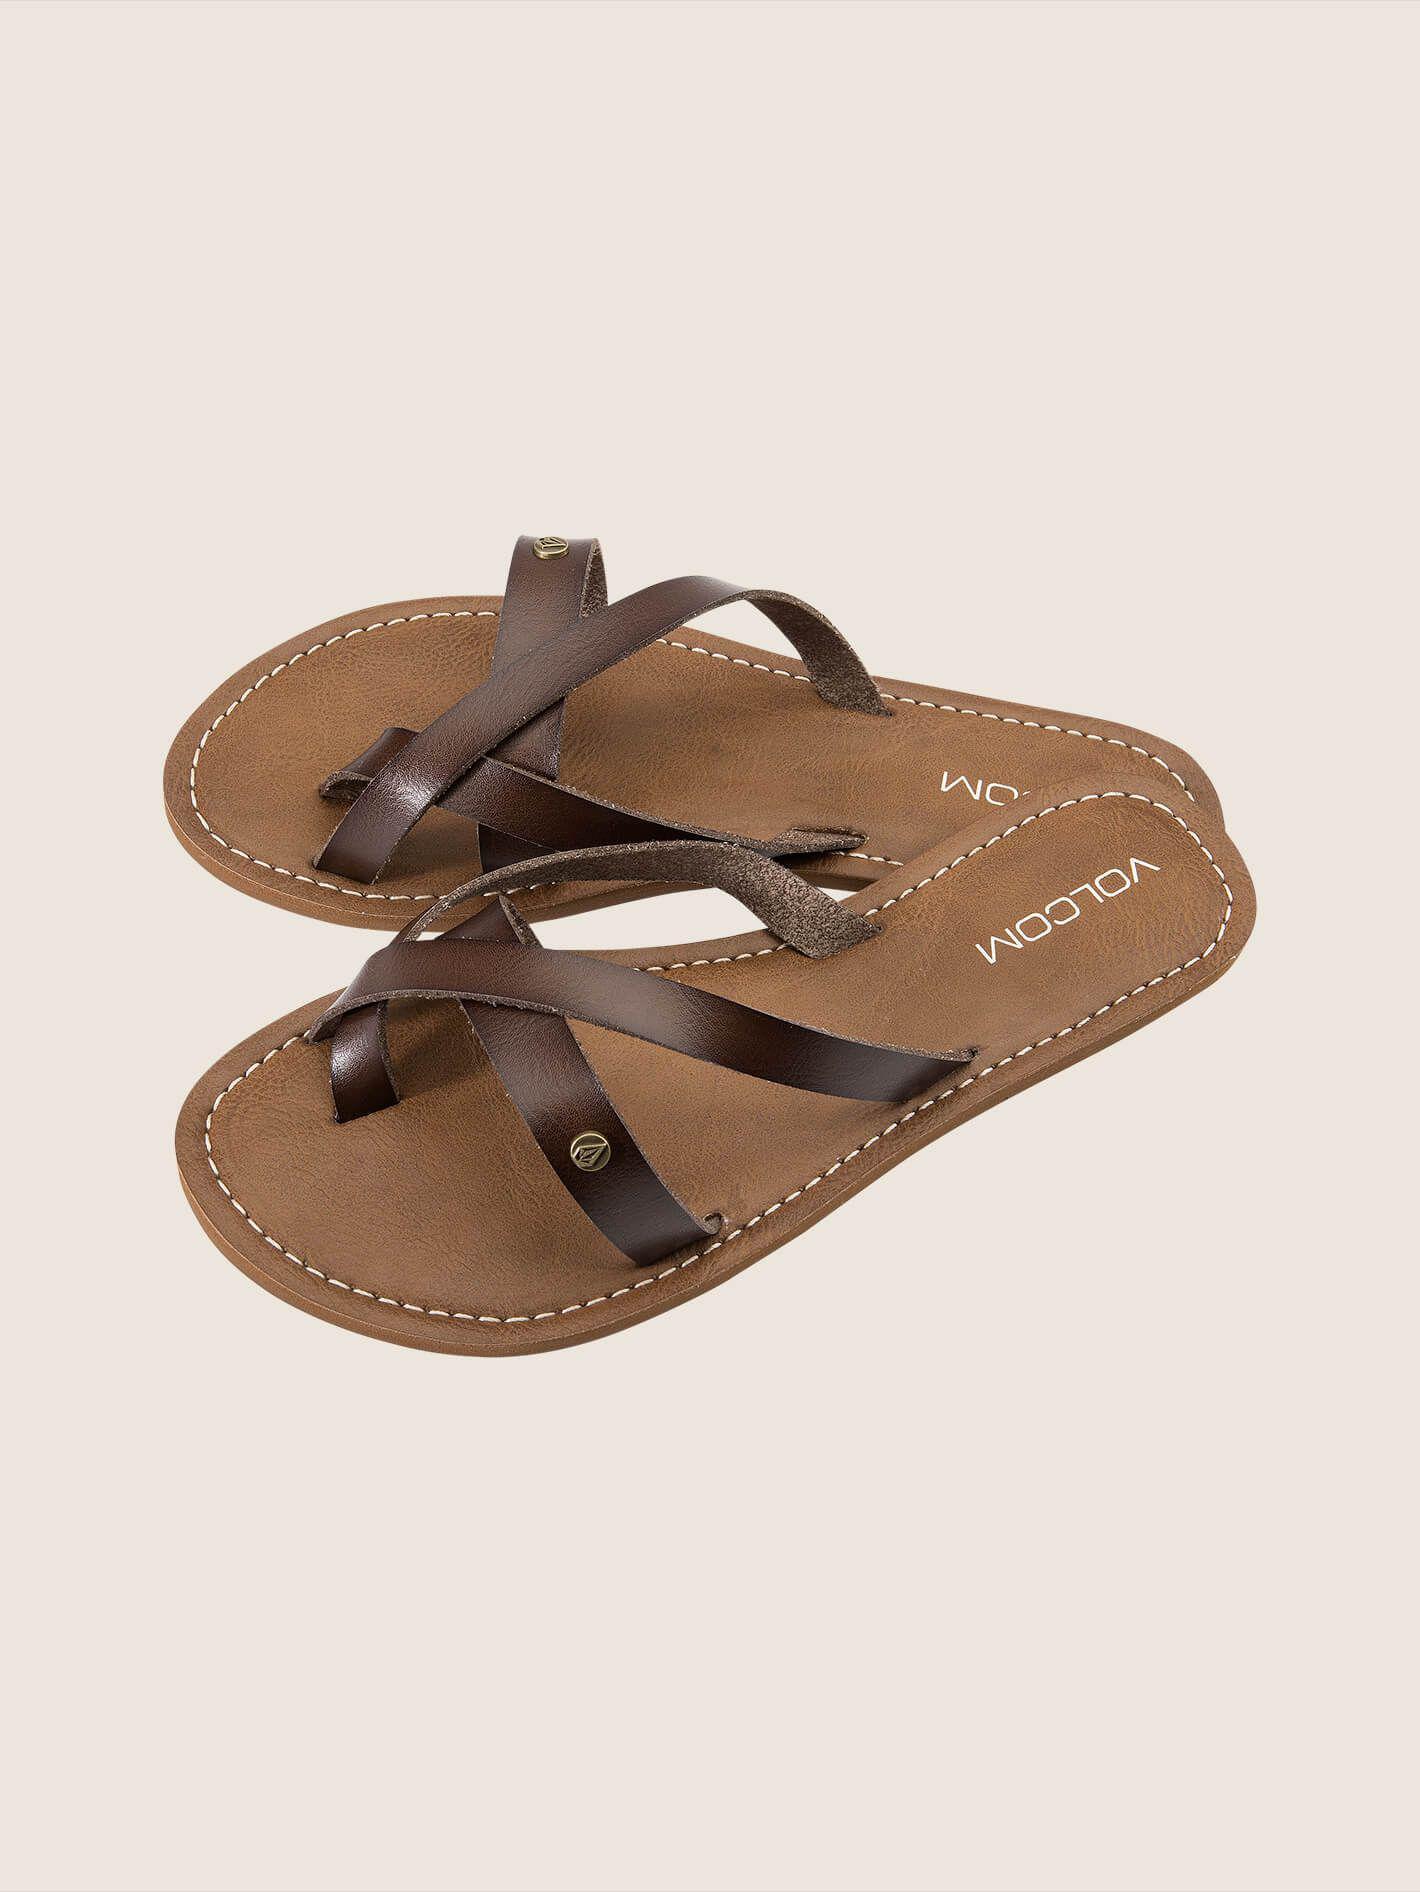 Volcom - Brown Ramble Sandals - Lyst. View Fullscreen